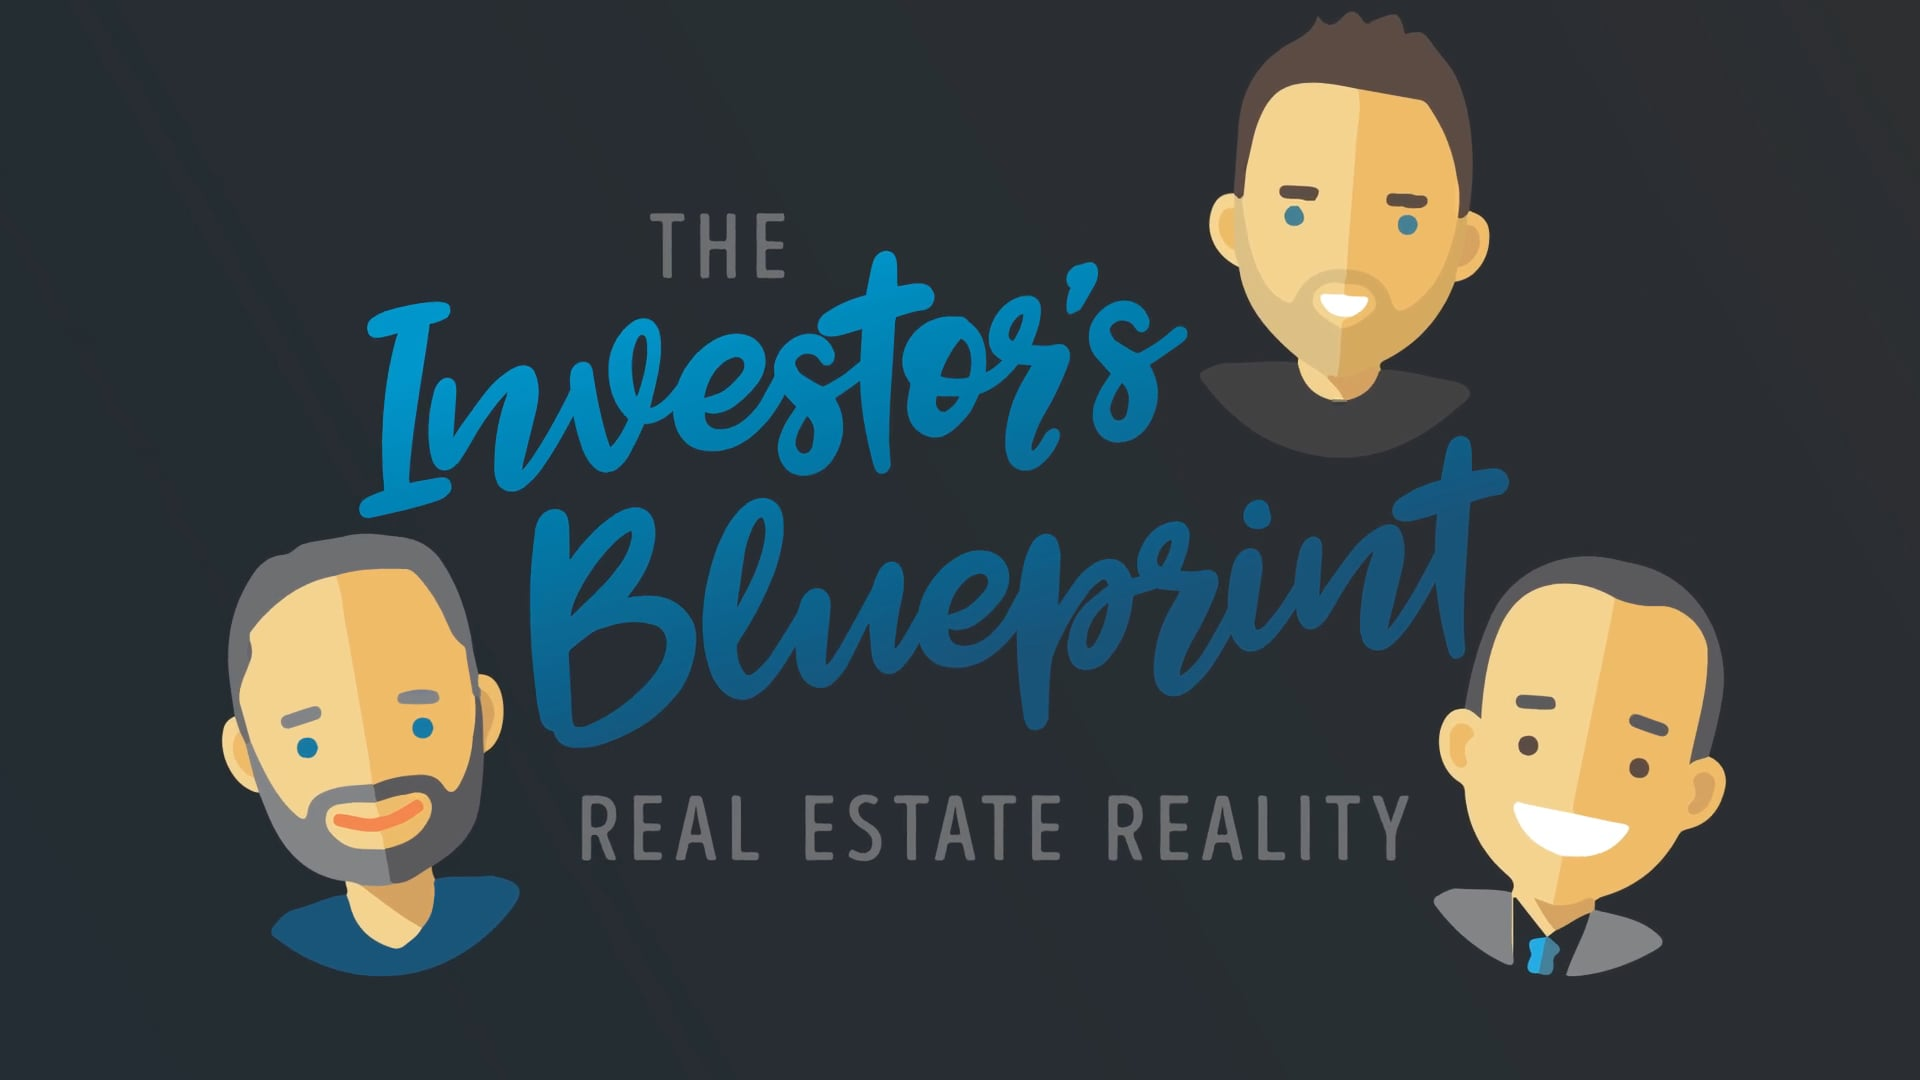 The Investor's Blueprint - REHAB Bootcamp Event Recap // Promotion 2017